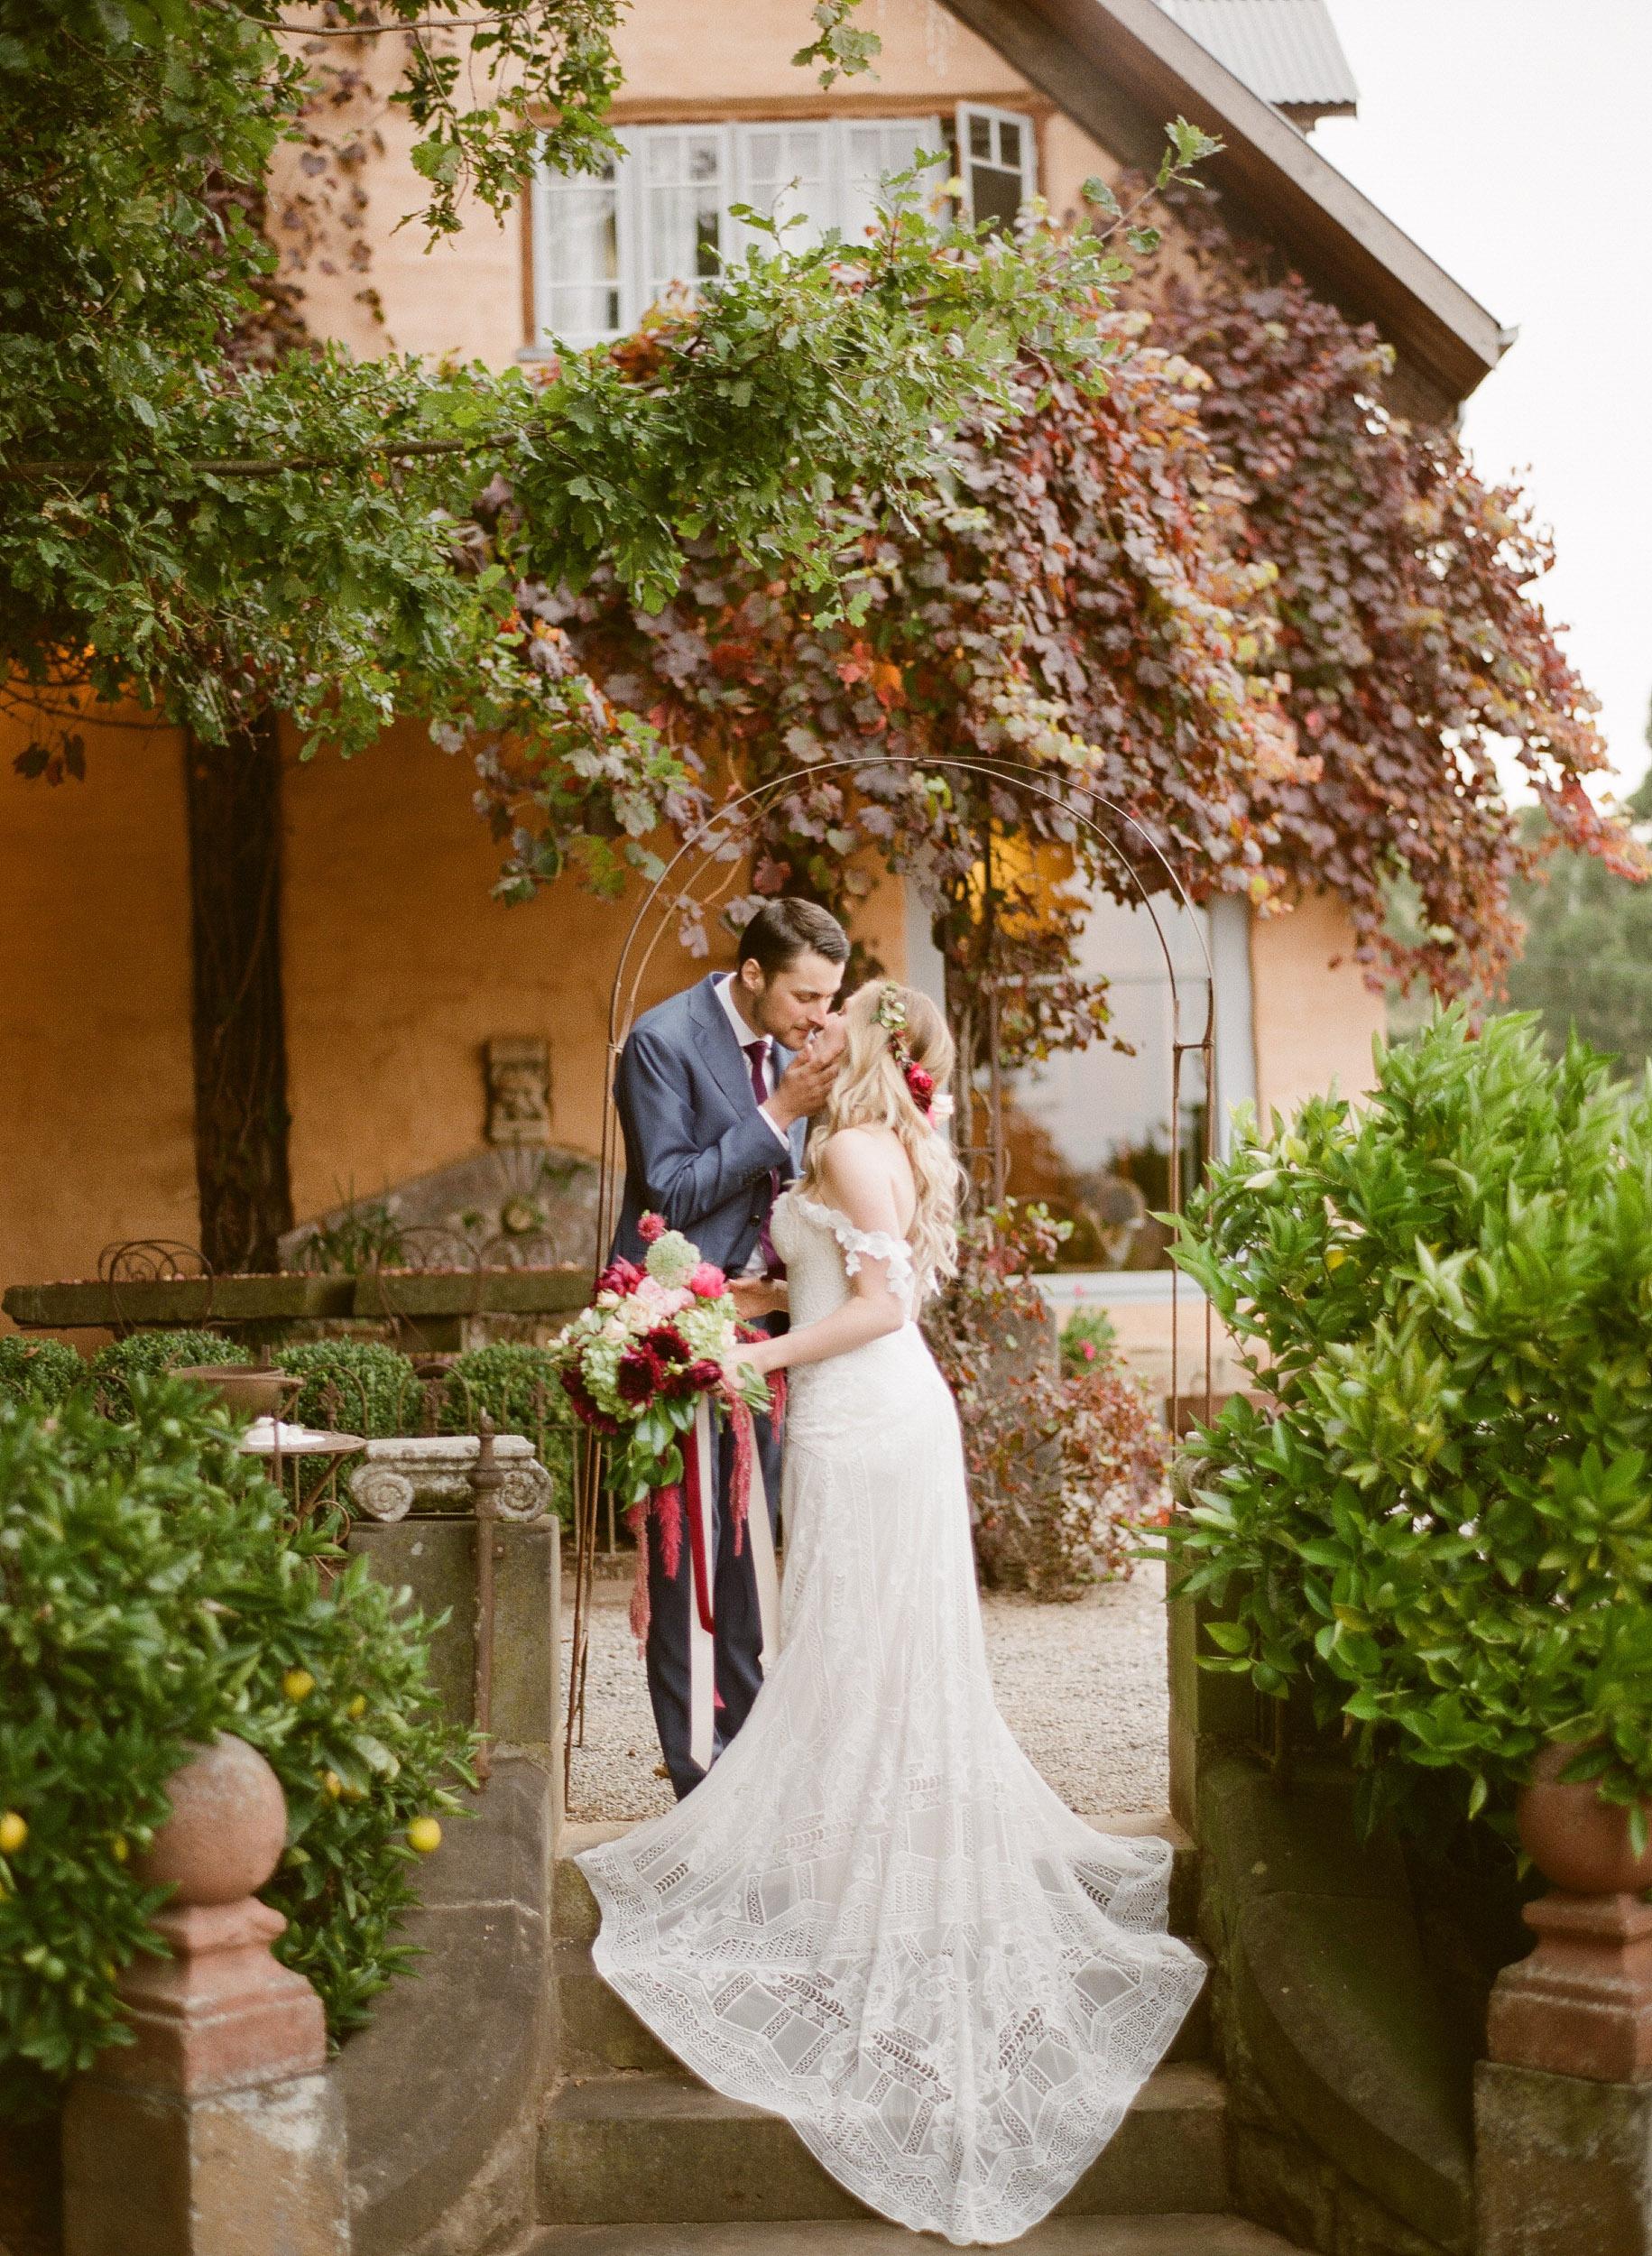 wedding (19 of 24) - 000098140011.jpg